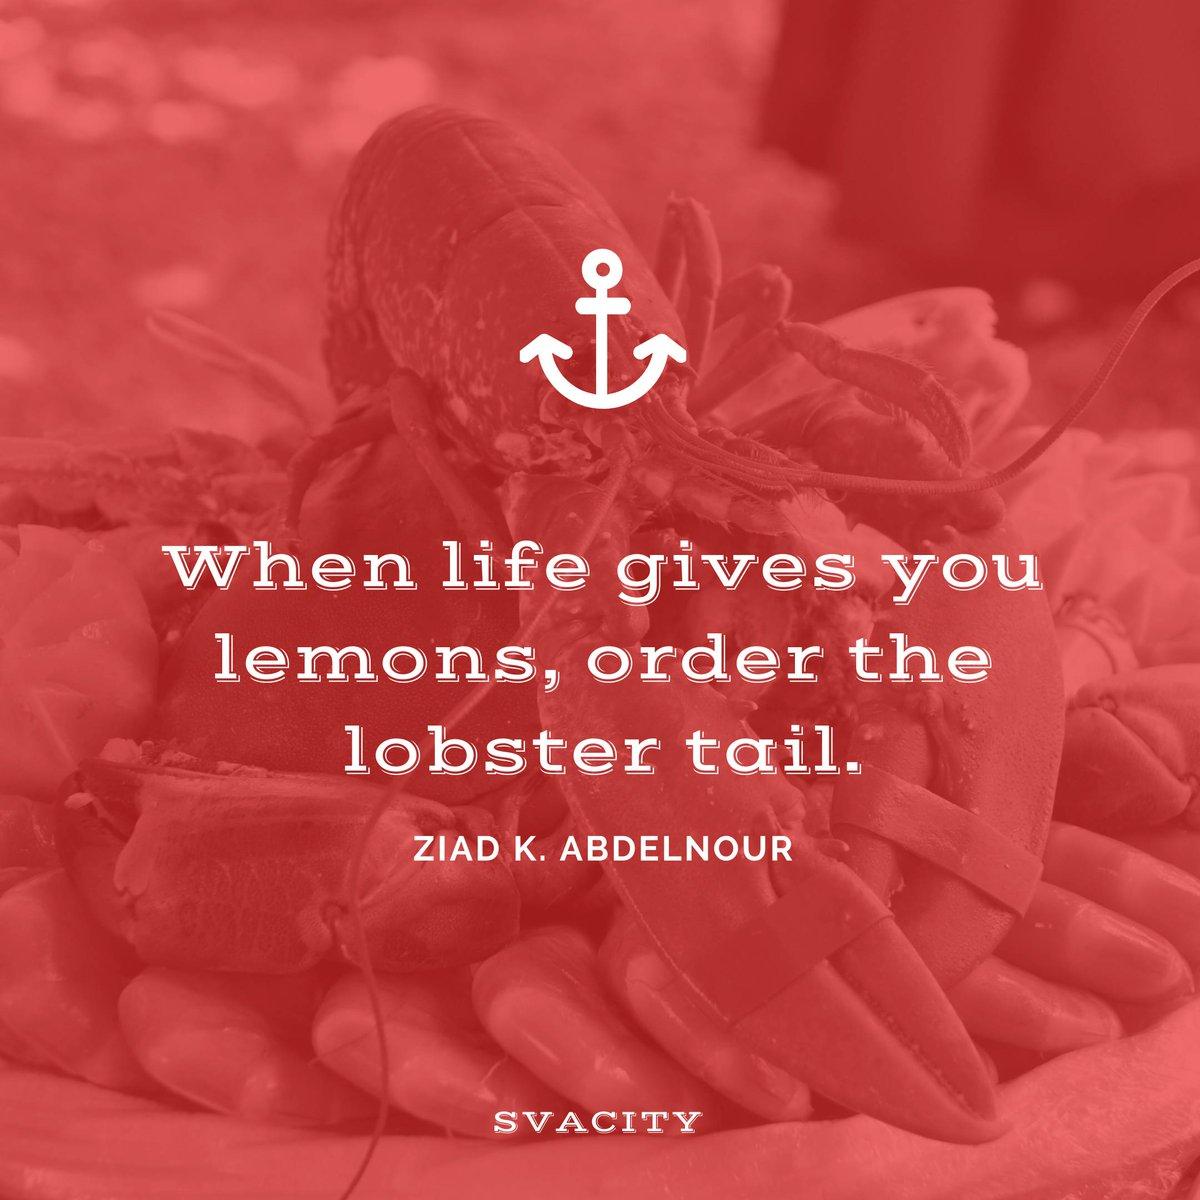 When life gives you lemons. Make the best of it. ❤ #motivation #lobster #lemons